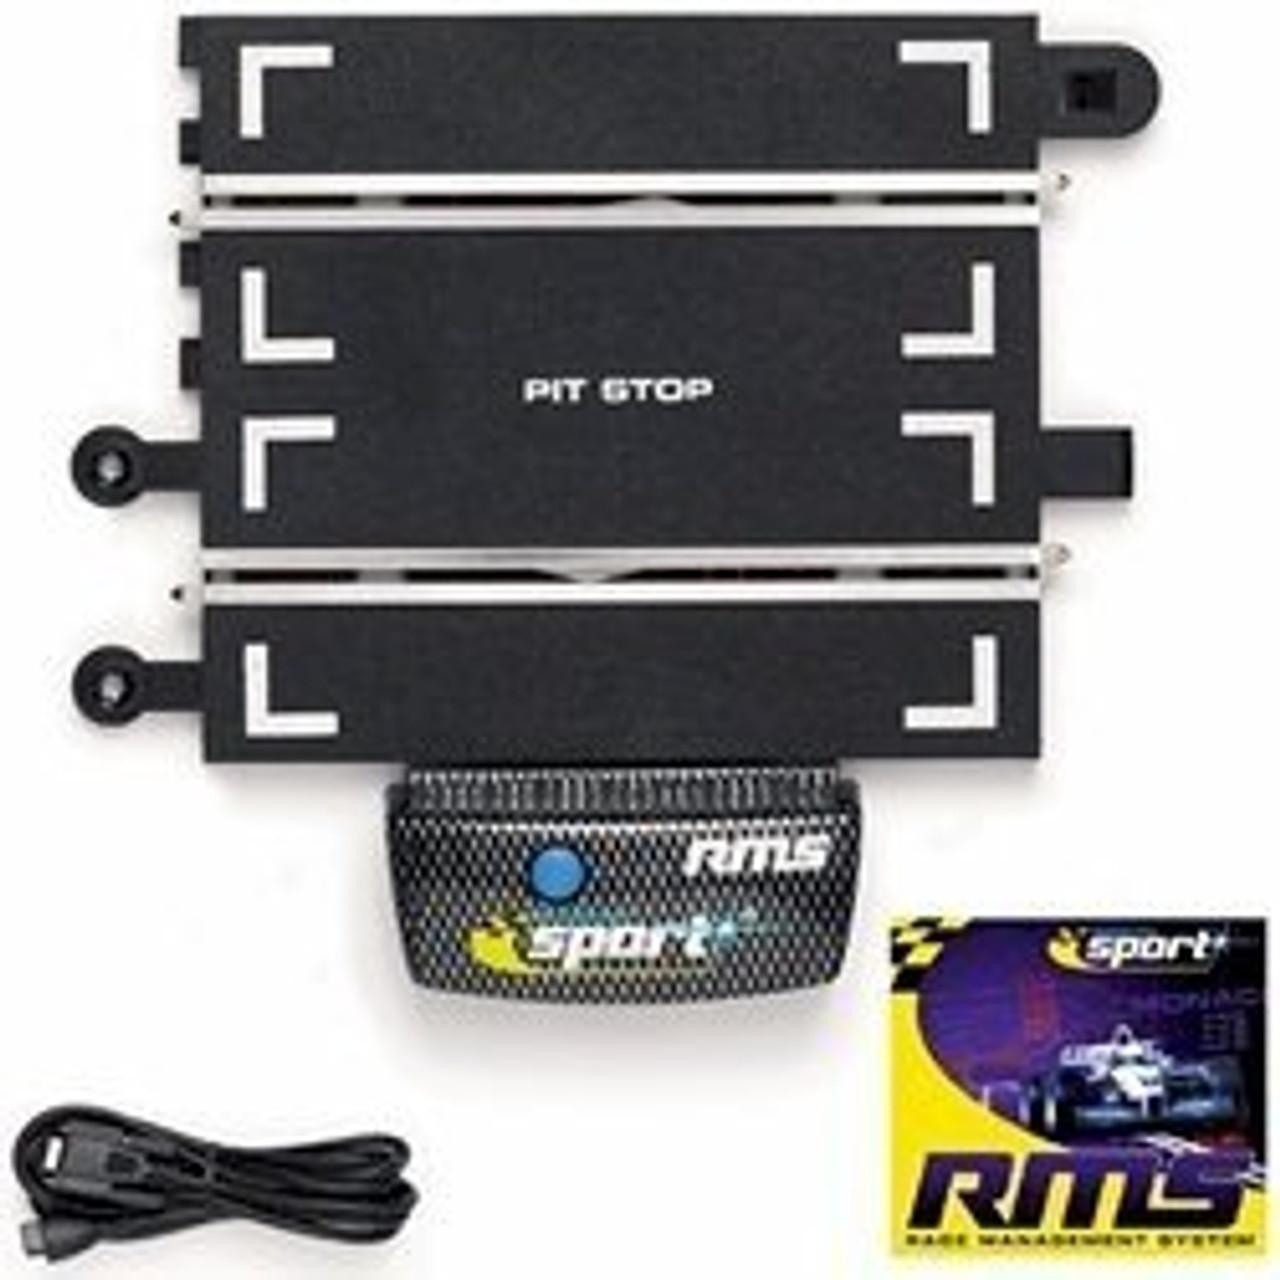 Scalextric C8147 Race Management System Slot Car Accessories